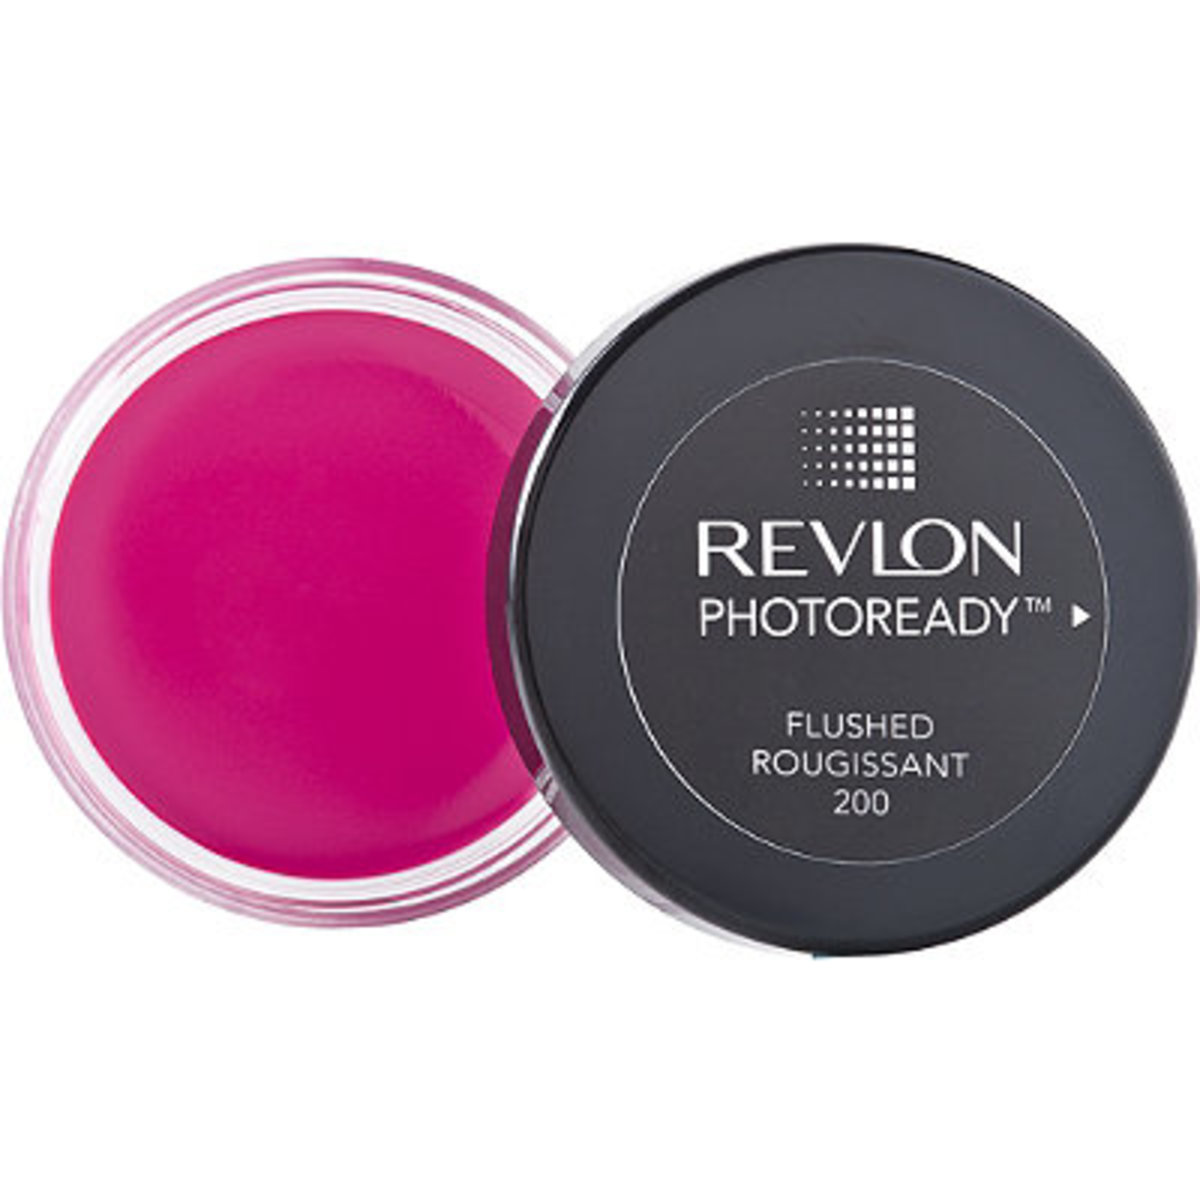 Revlon Photo Ready Cream Blush in Flushed